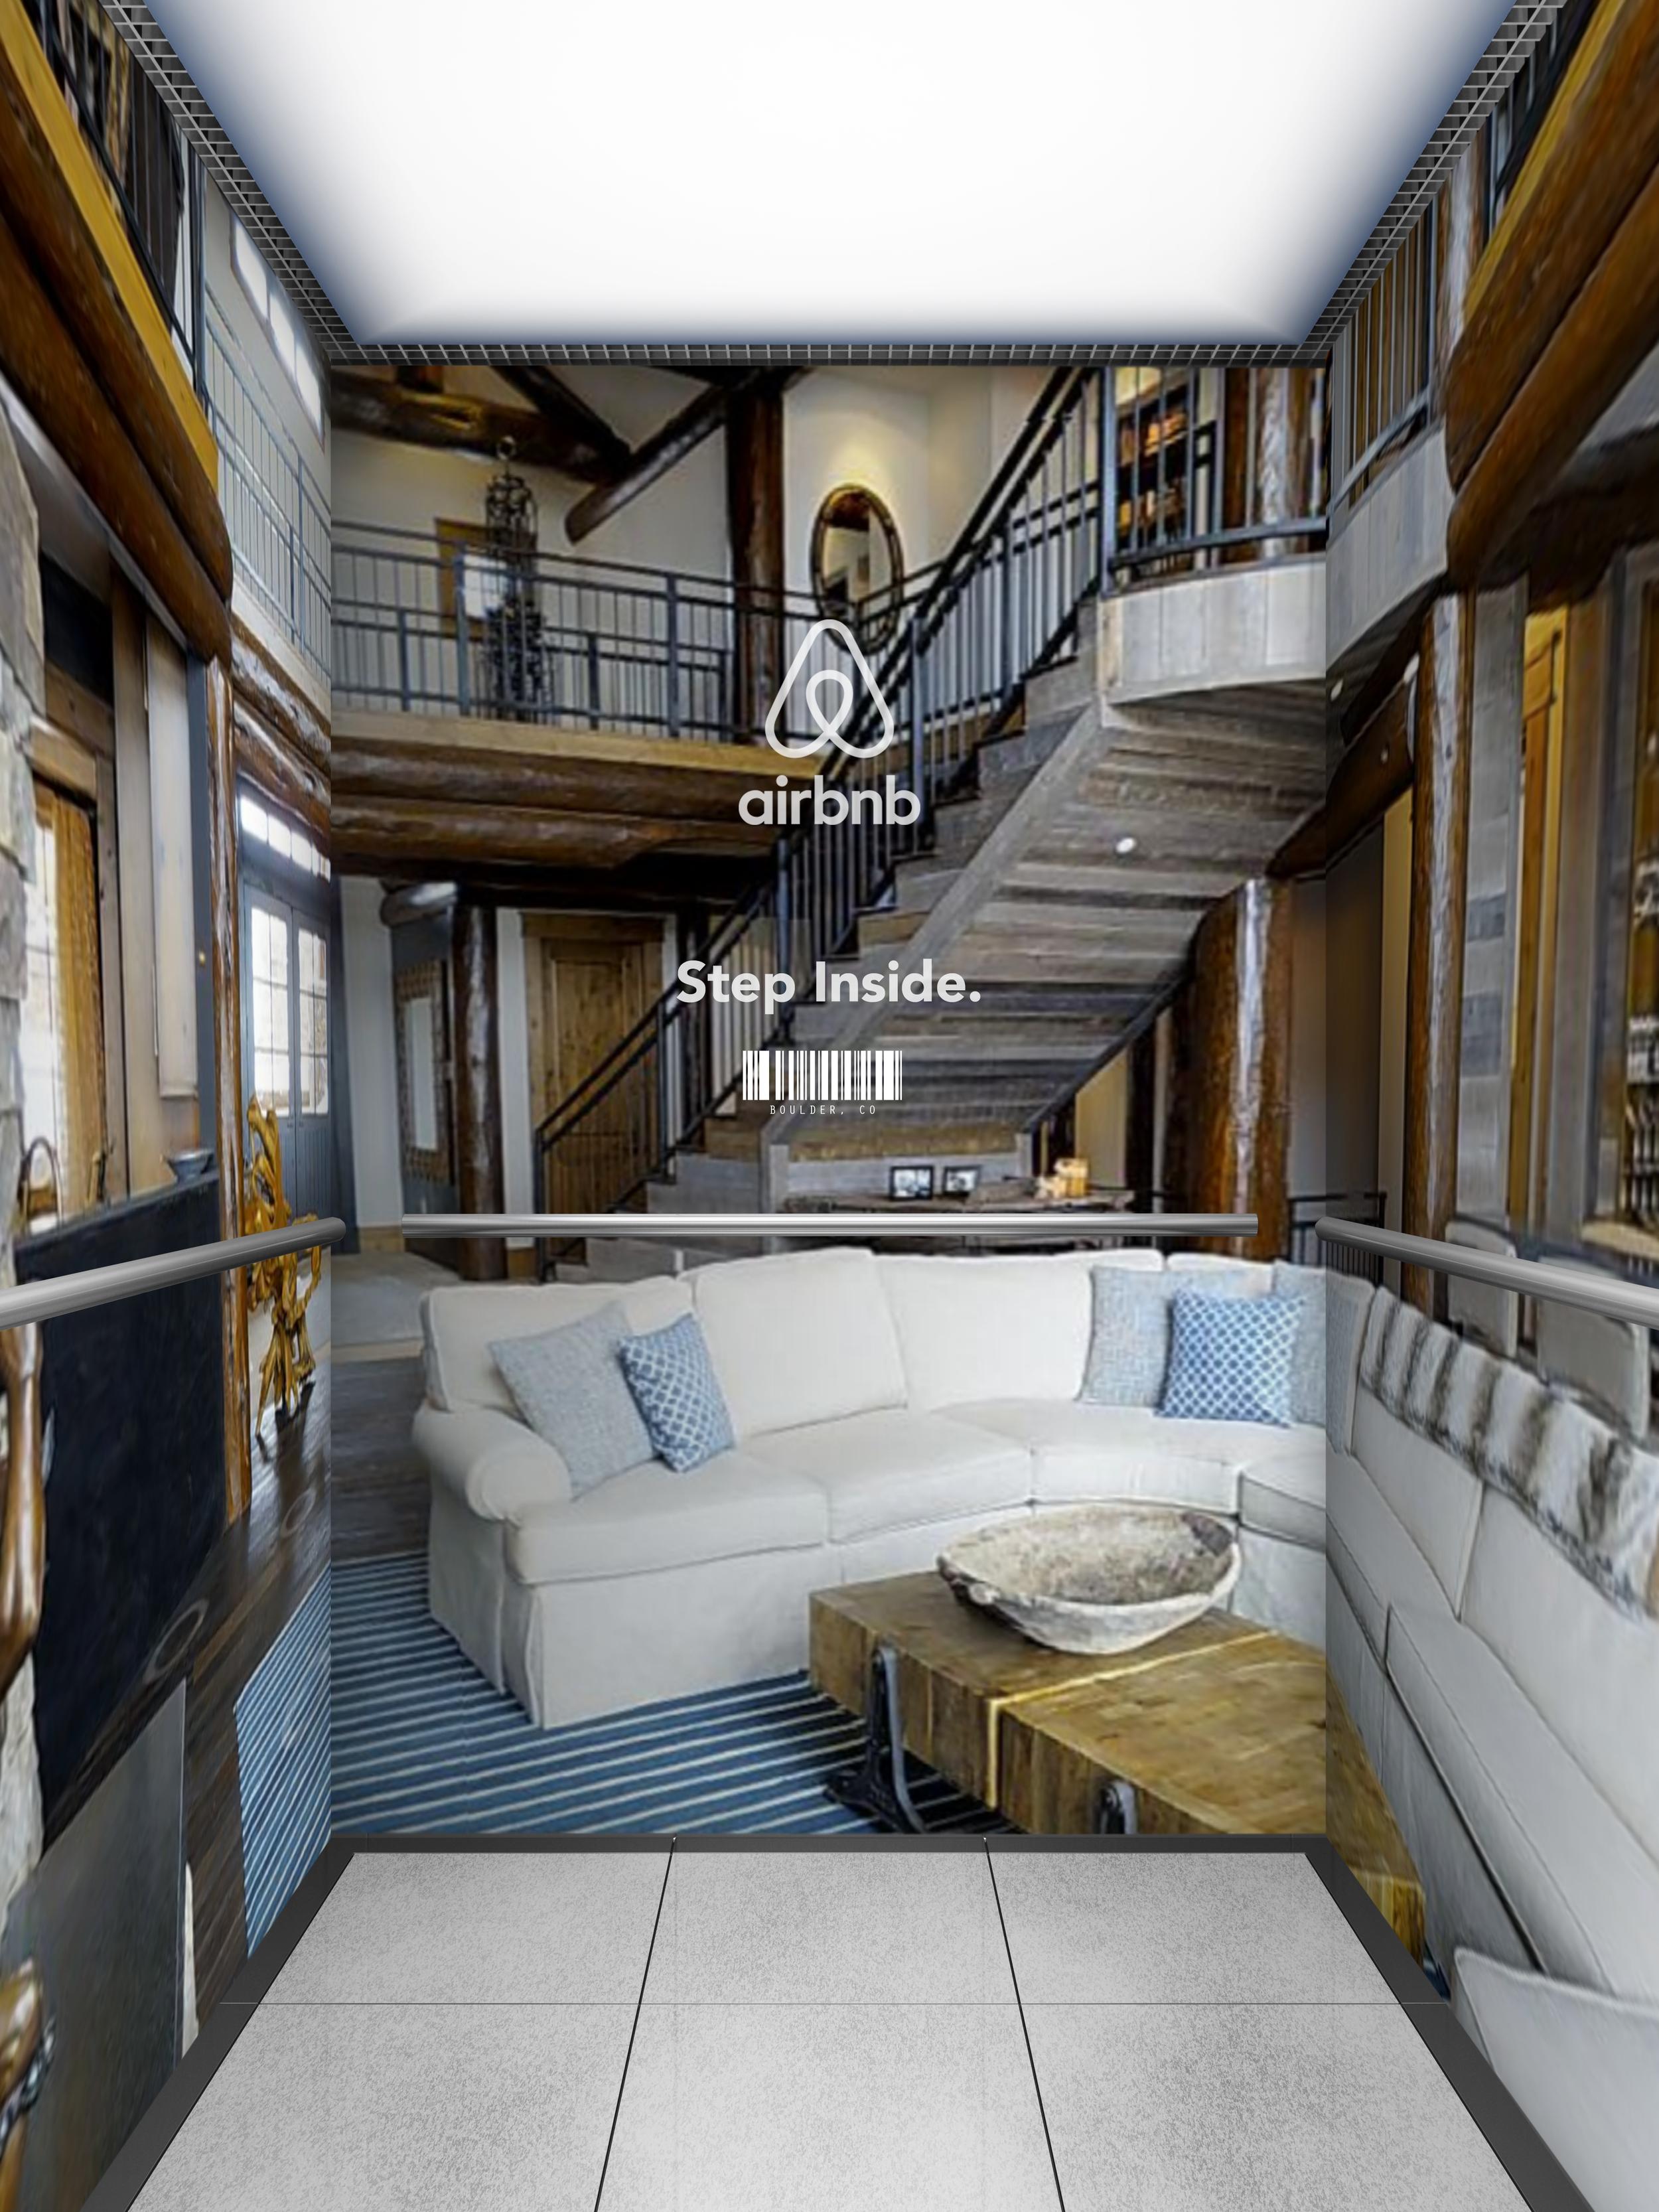 Airbnb-Inside-Mockup1.png